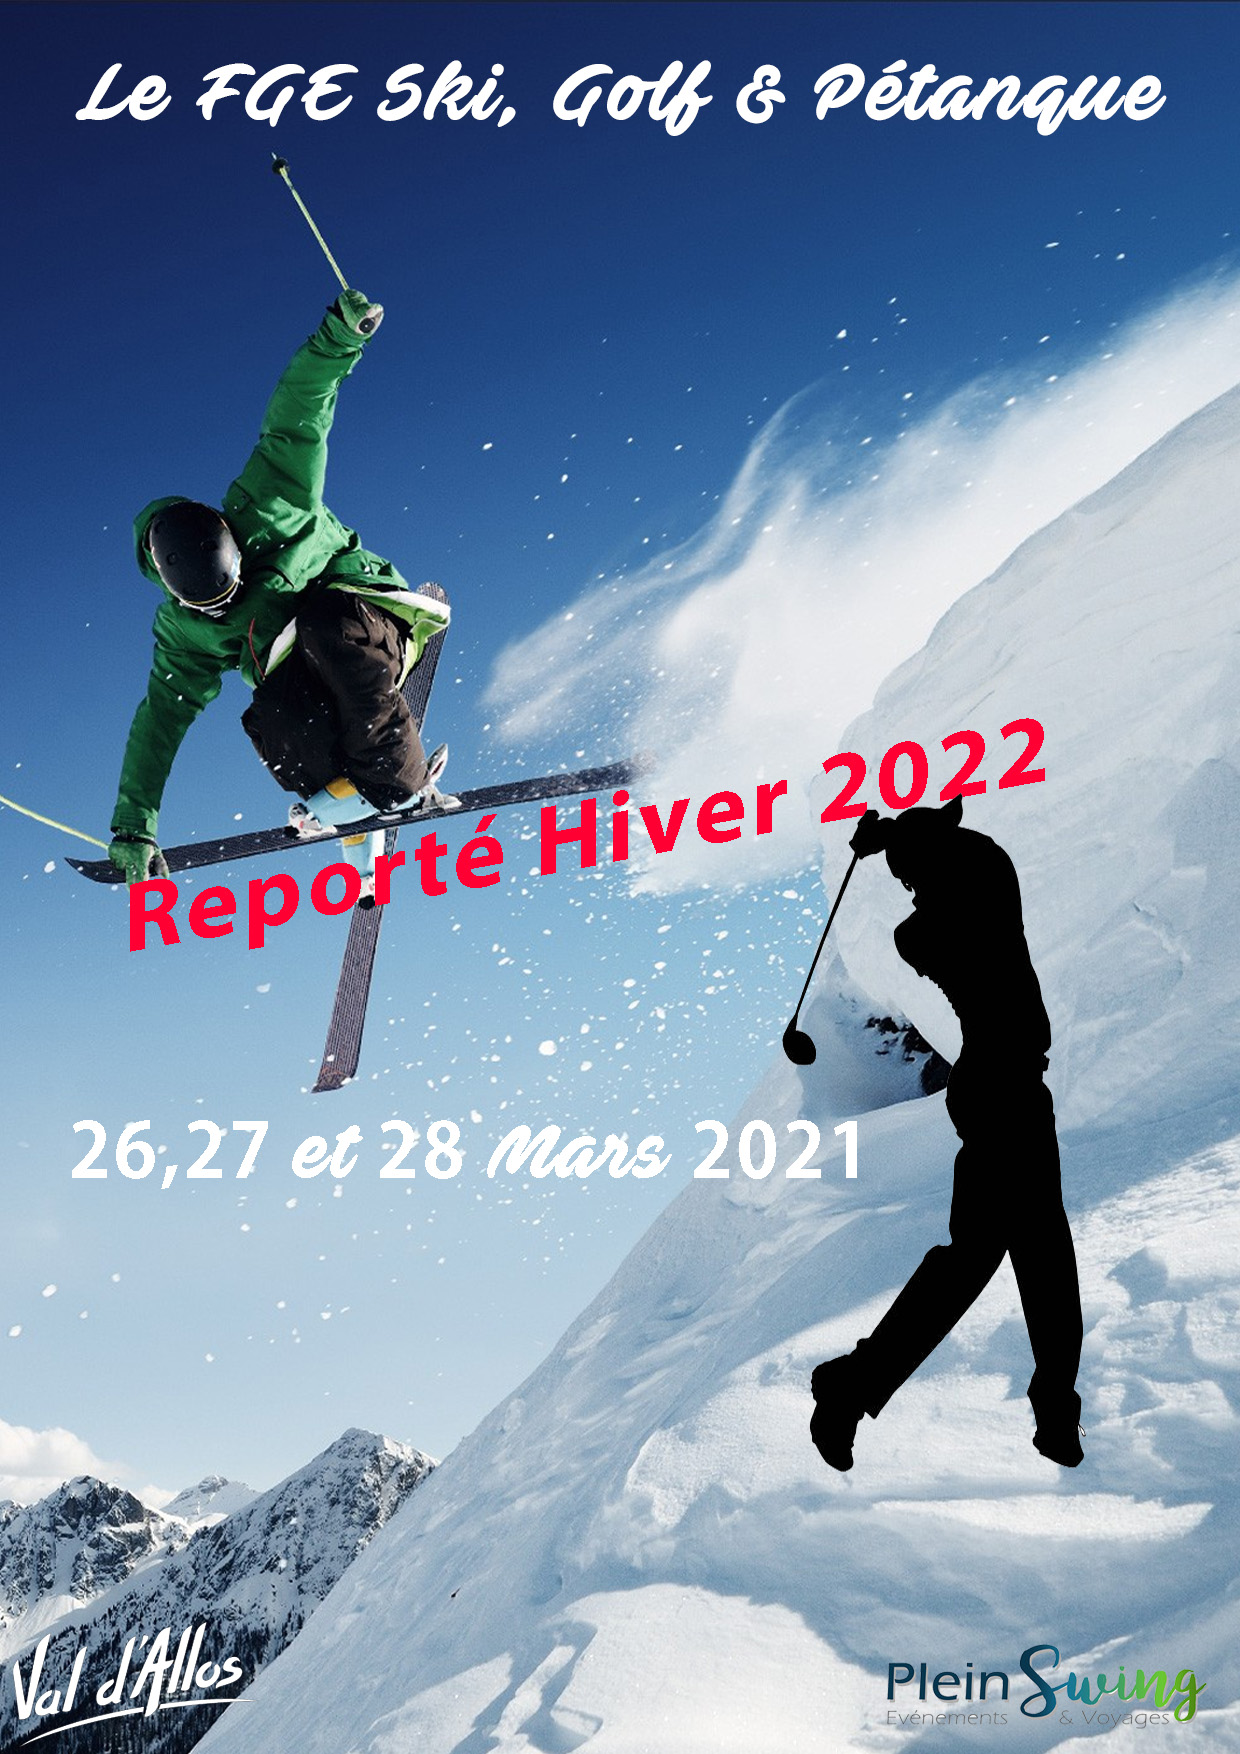 FGE Ski-Golf-Pétanque